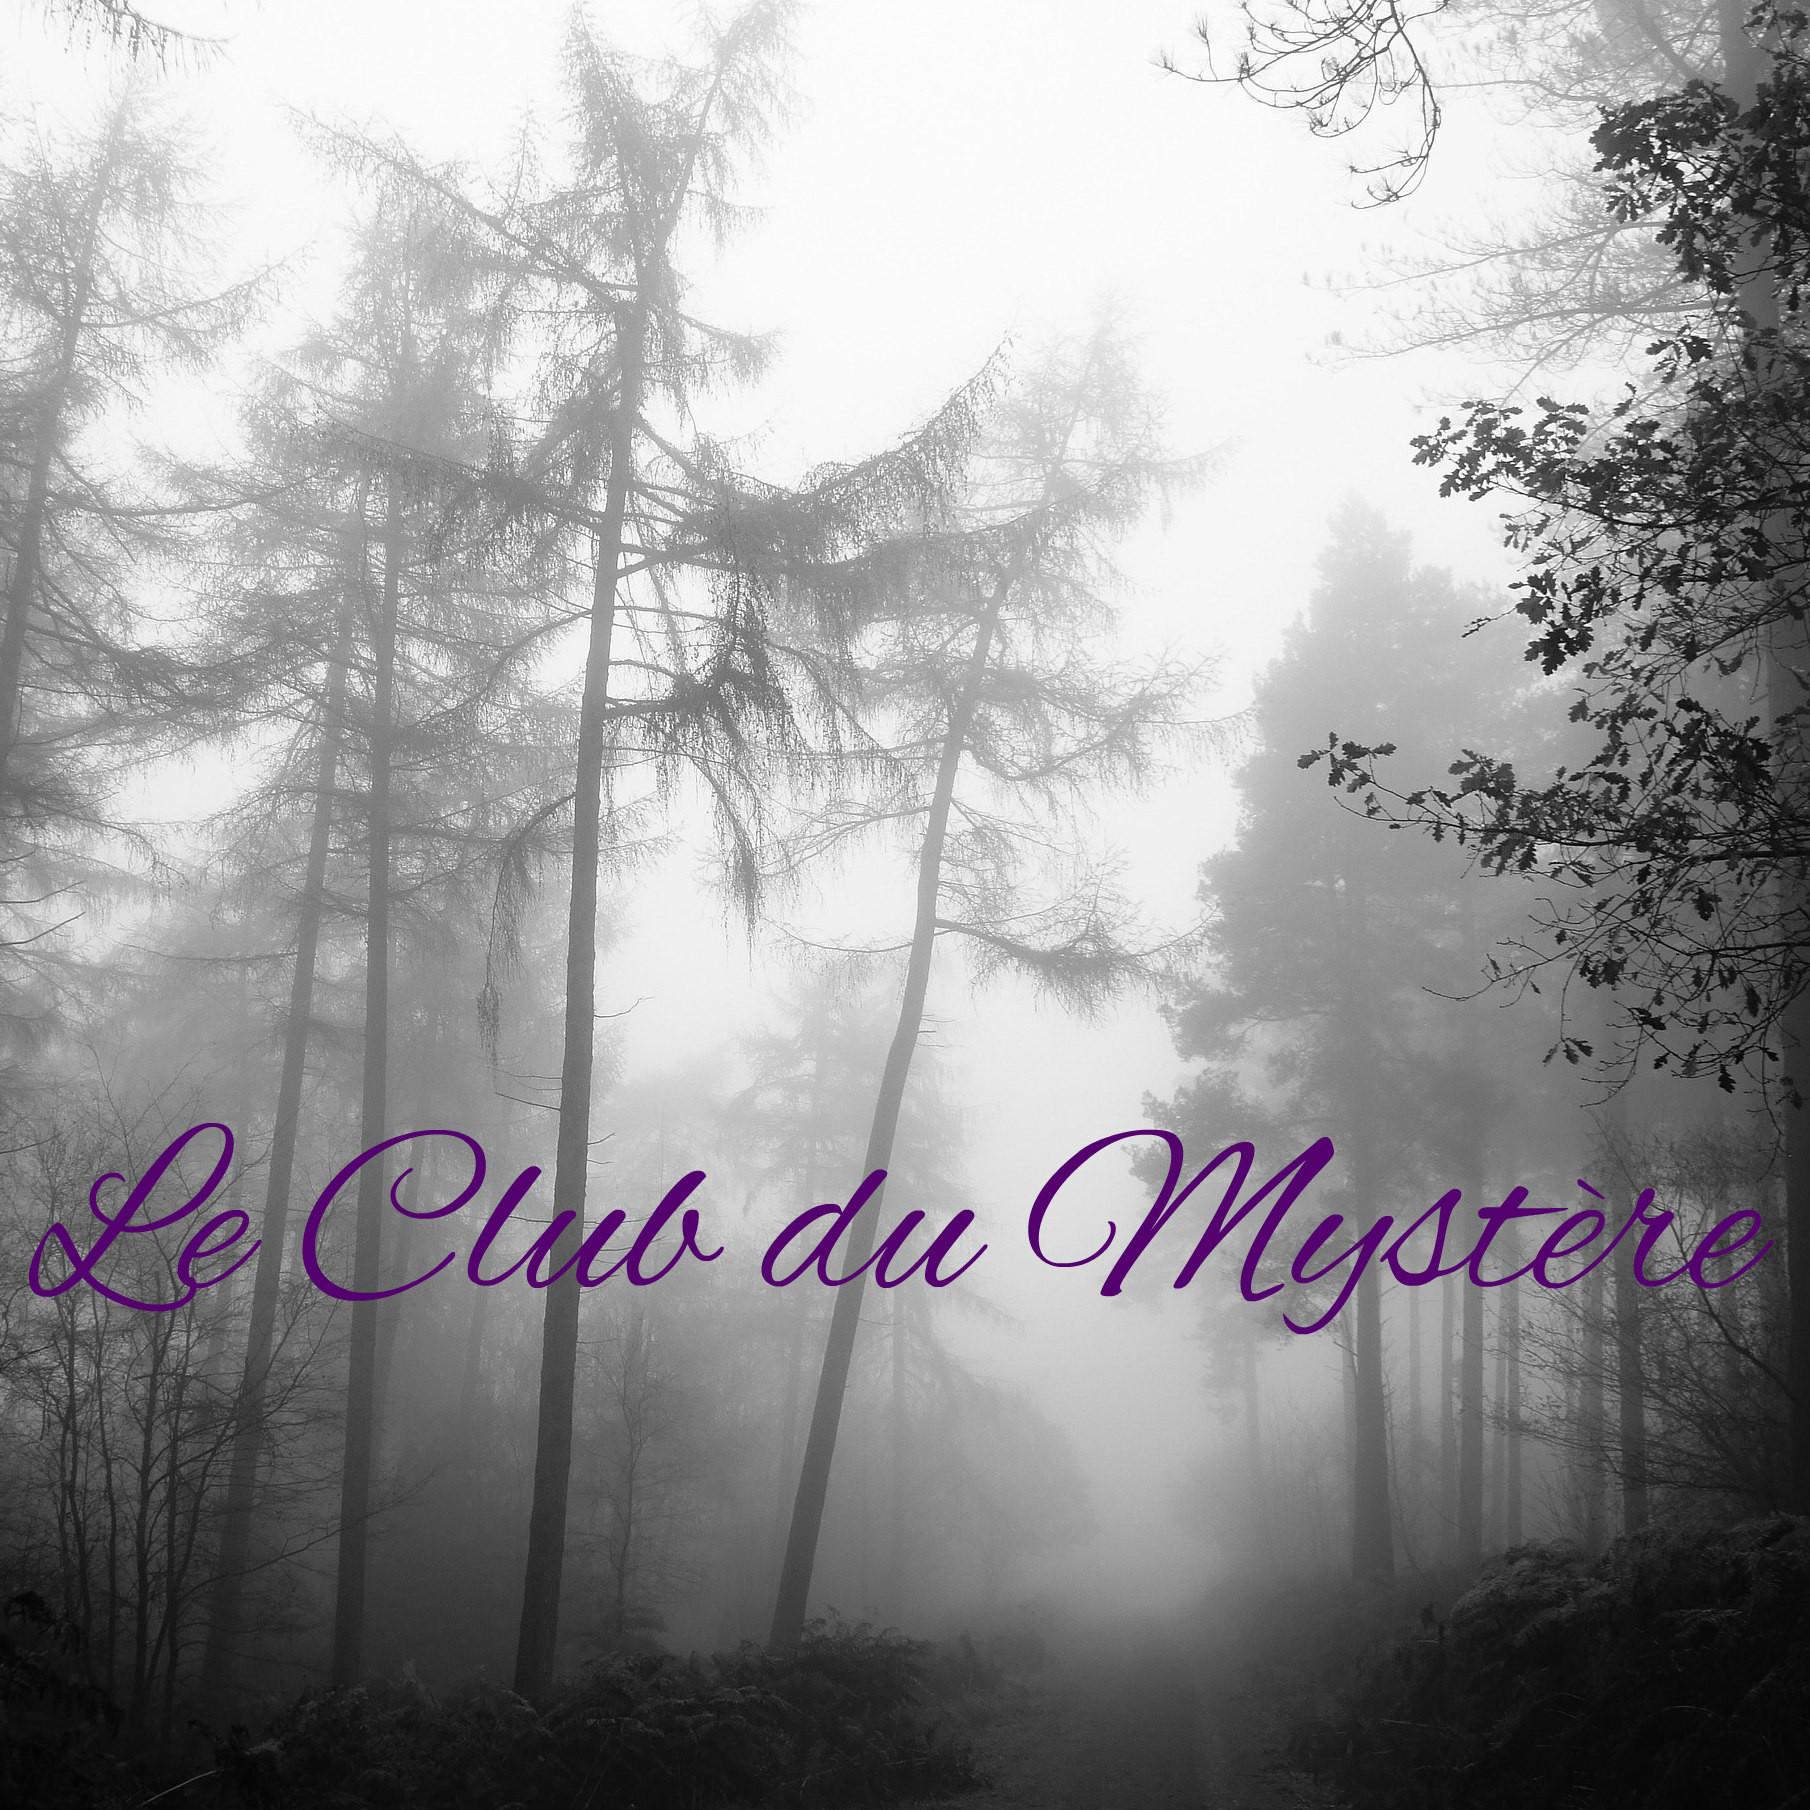 La disparition d'Agatha Christie - L'Enigme de la Morris Cowley